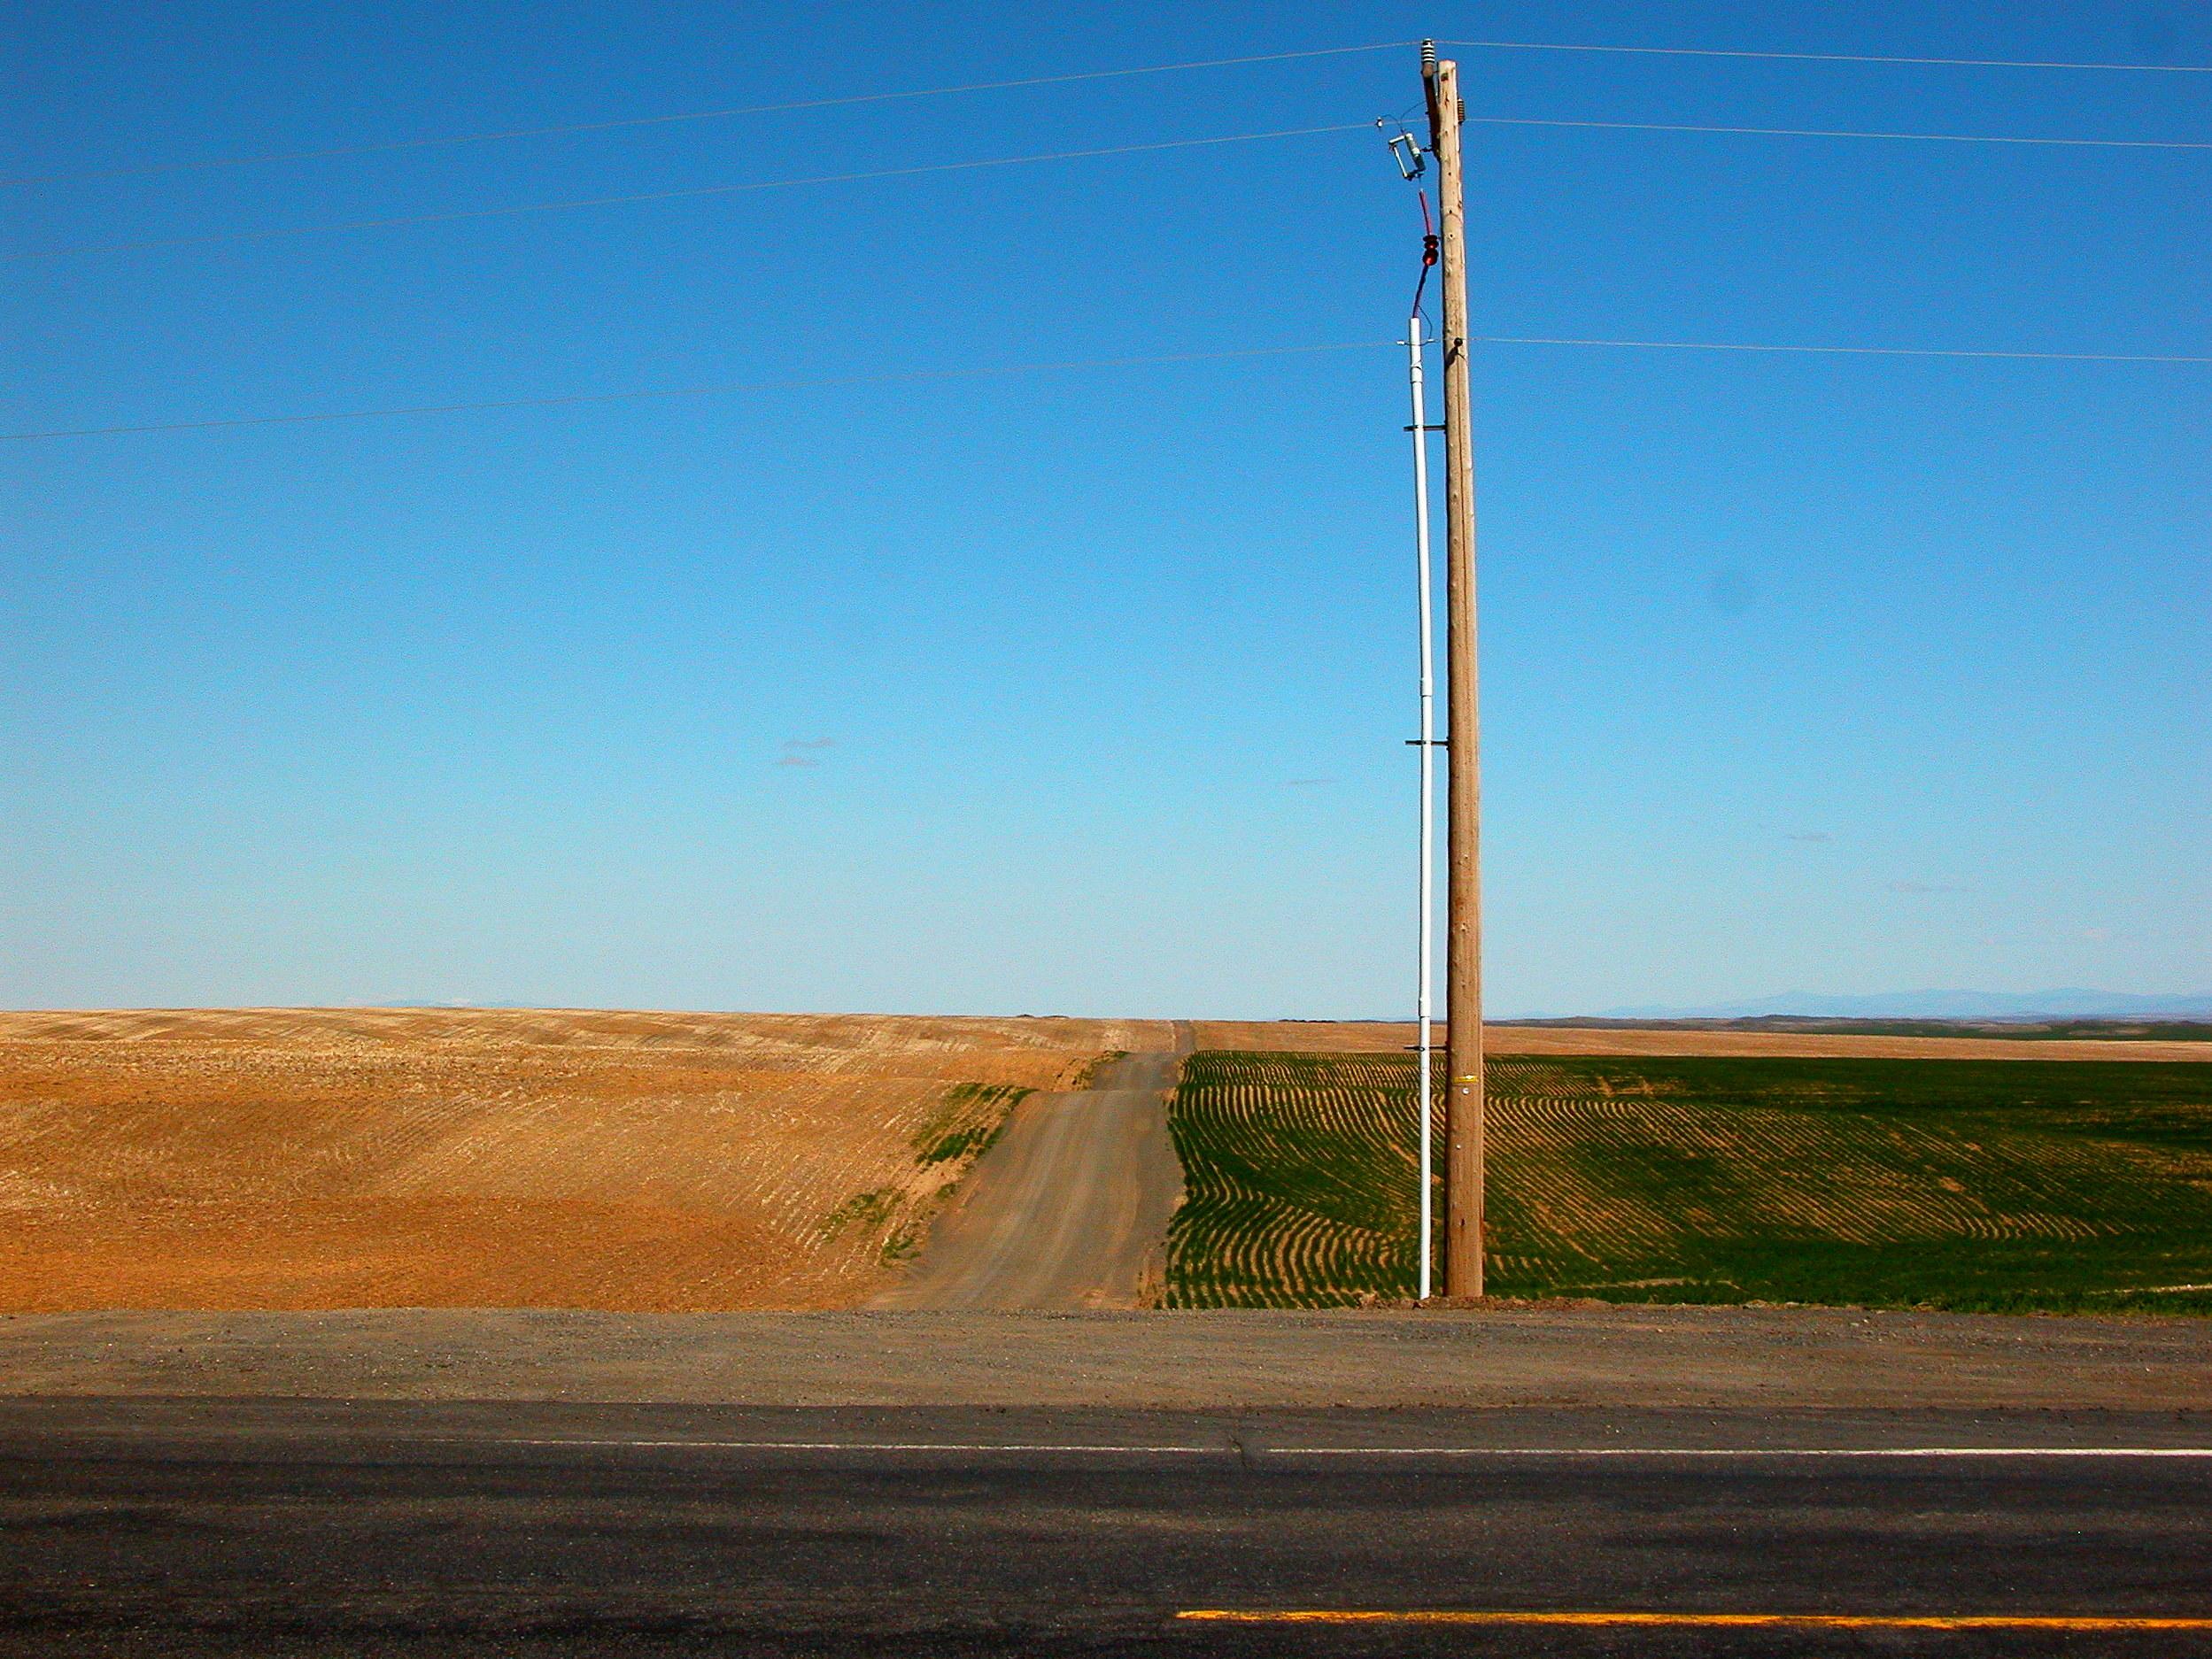 Highland School Road, US2, WA